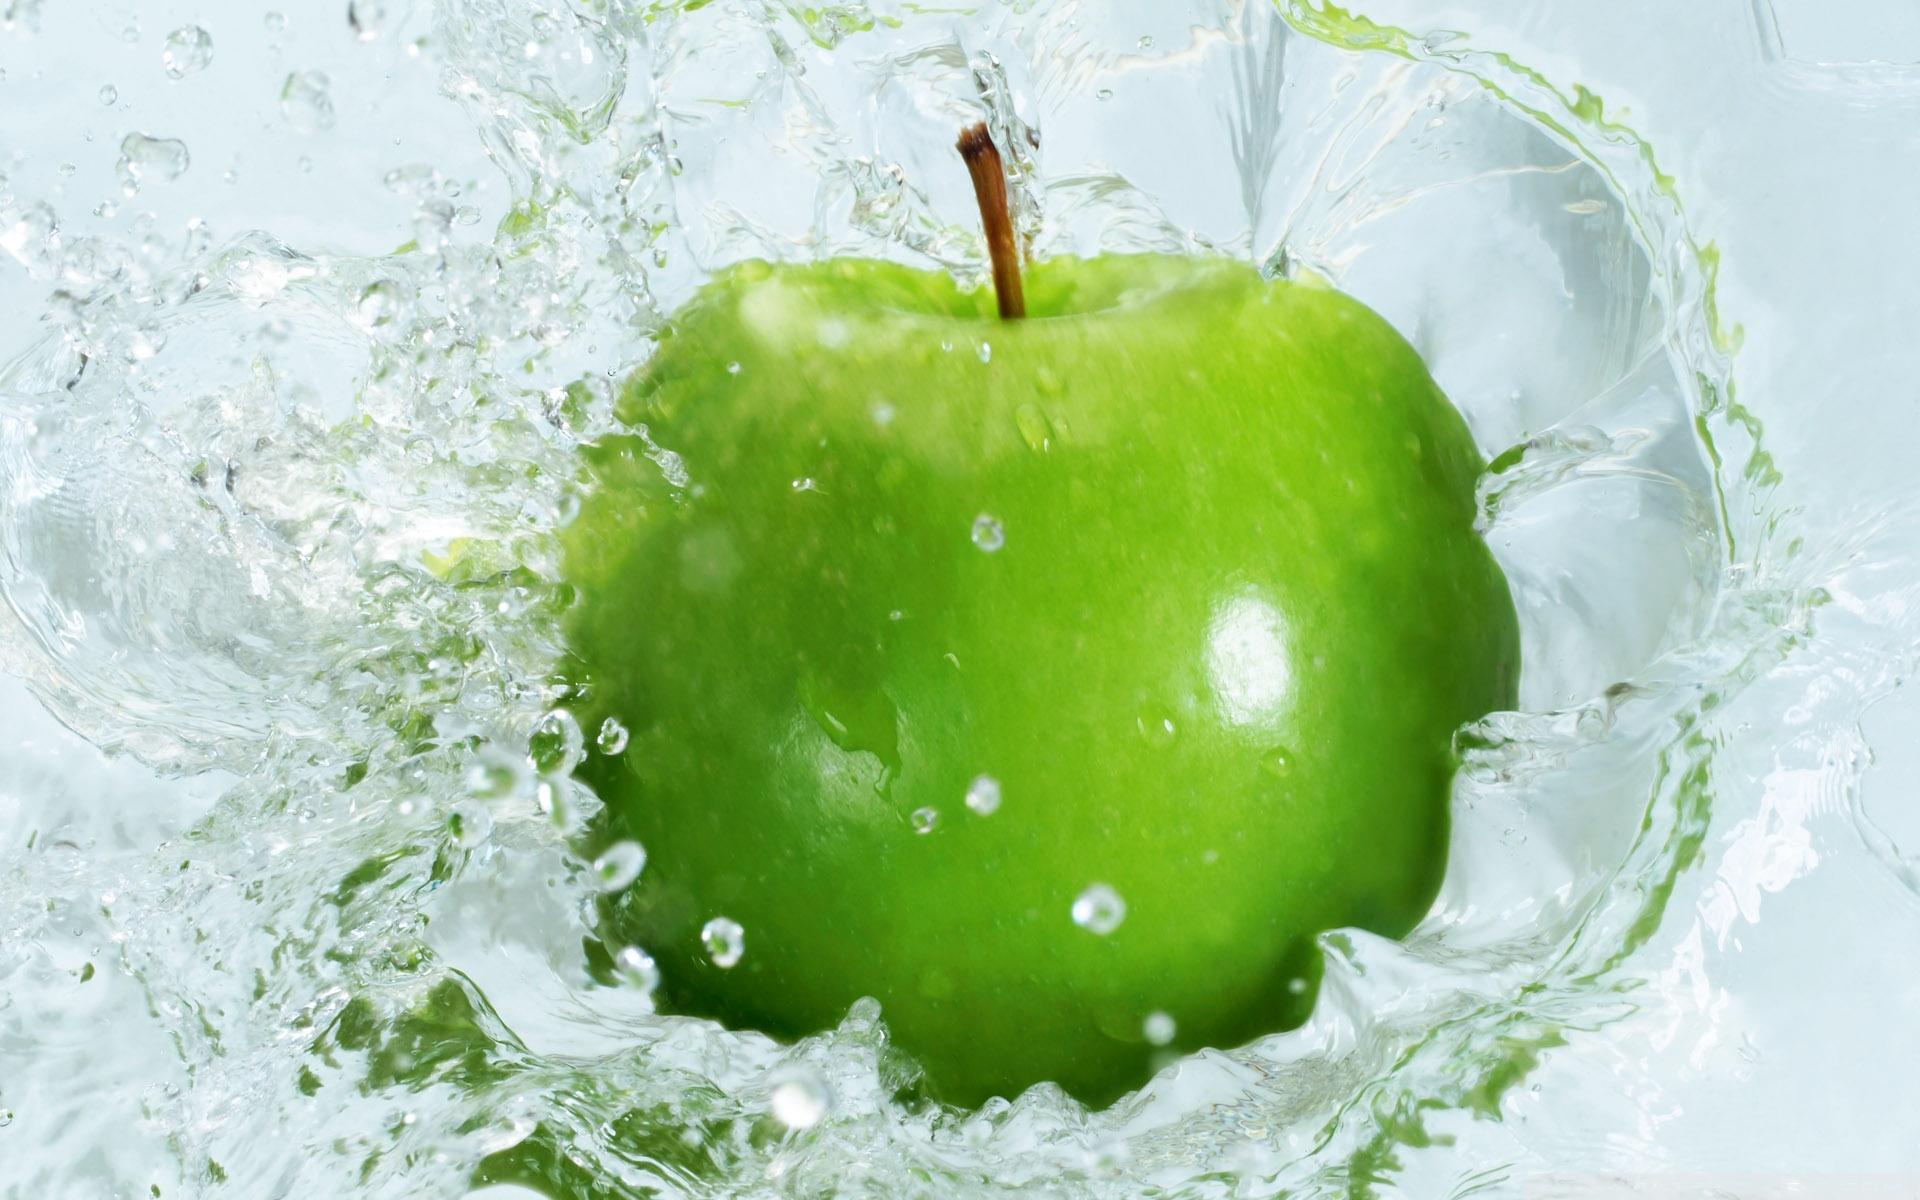 Green Apple Wallpapers